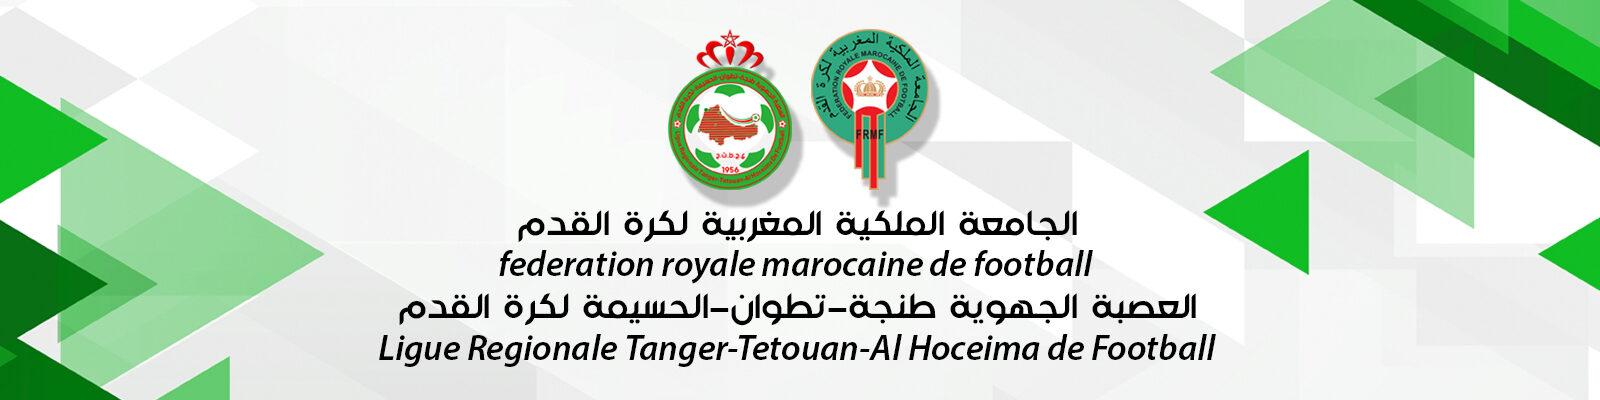 Ligue Regionale Tanger-Tetouan-Al Hoceima